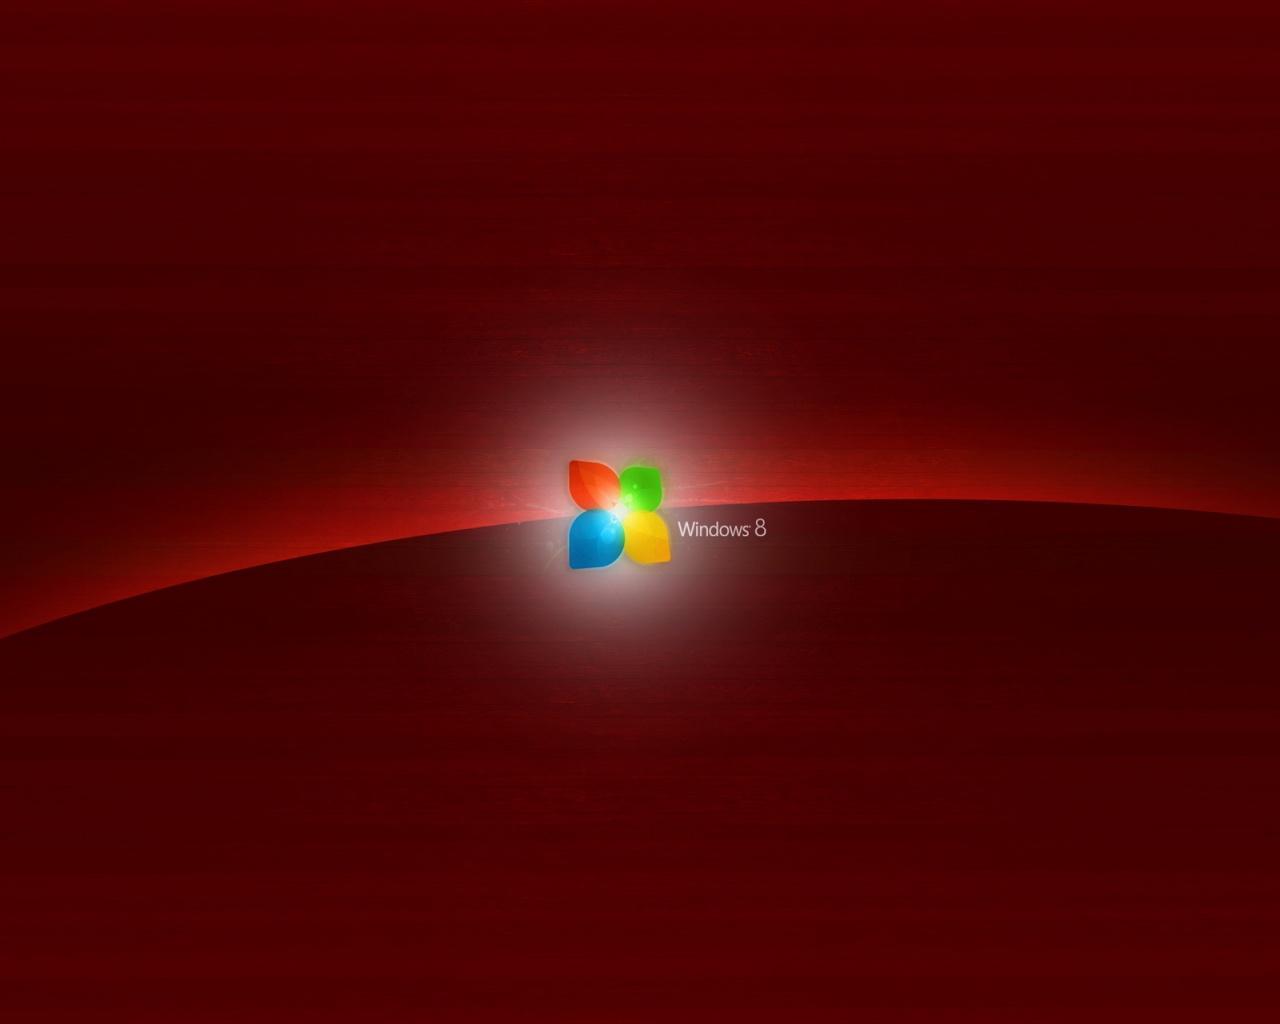 1280x1024 Dark Red Windows 8 desktop PC and Mac wallpaper 1280x1024